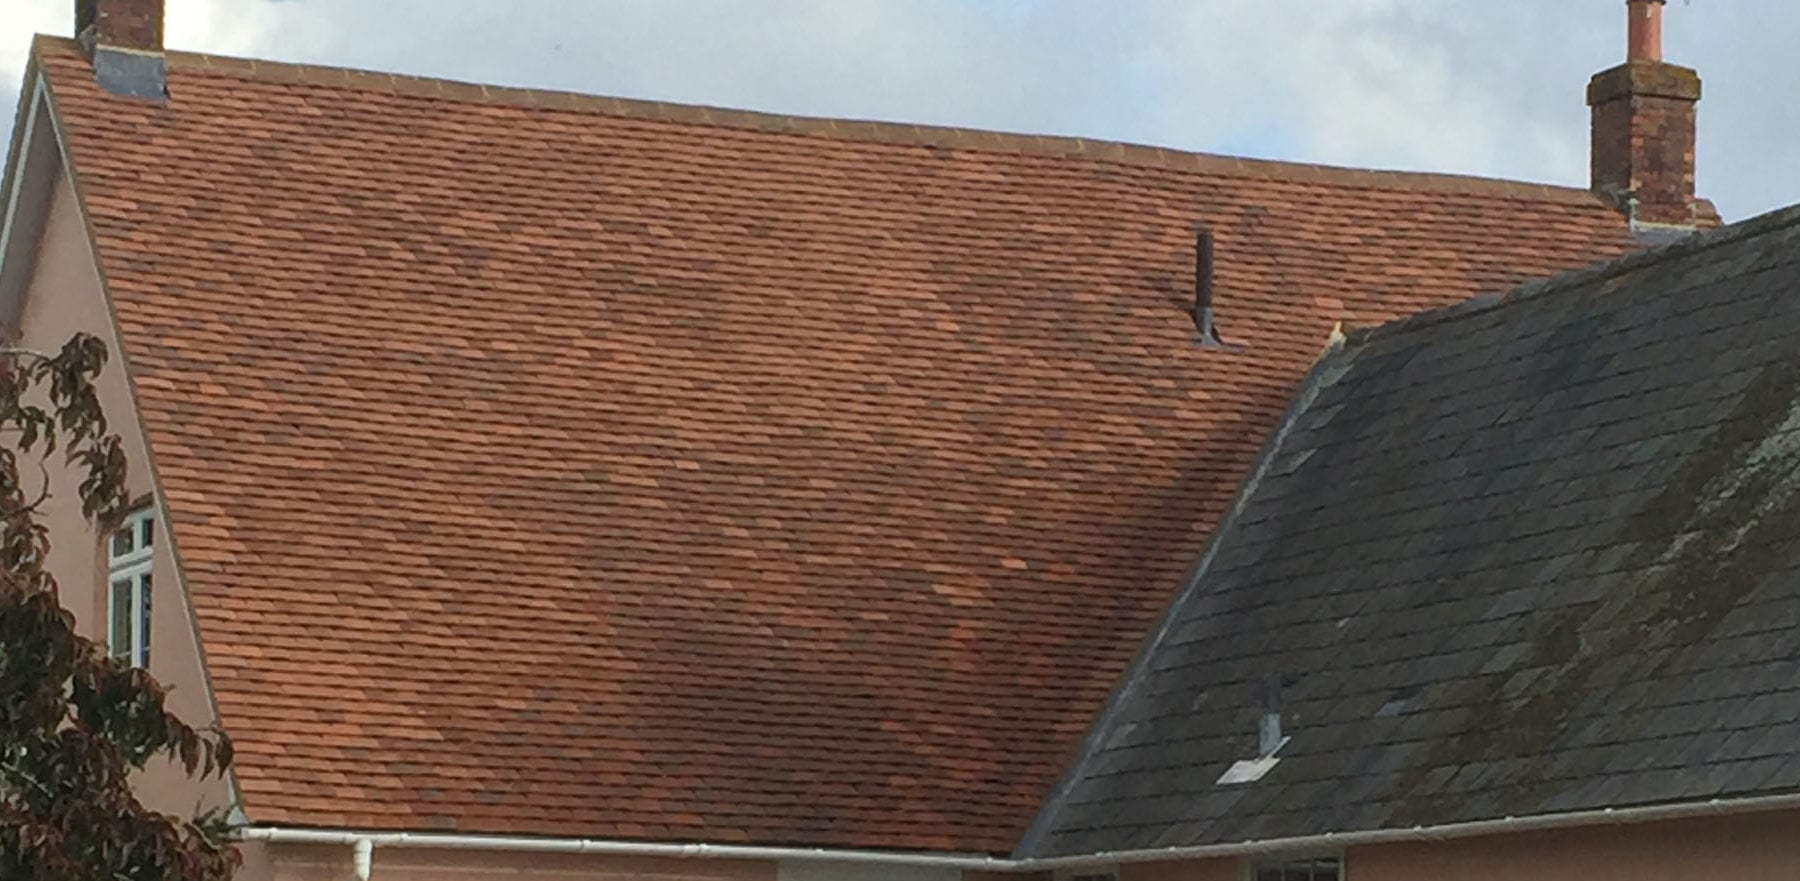 Lifestiles - Handmade Brown Clay Roof Tiles - Stockbridge, England 4